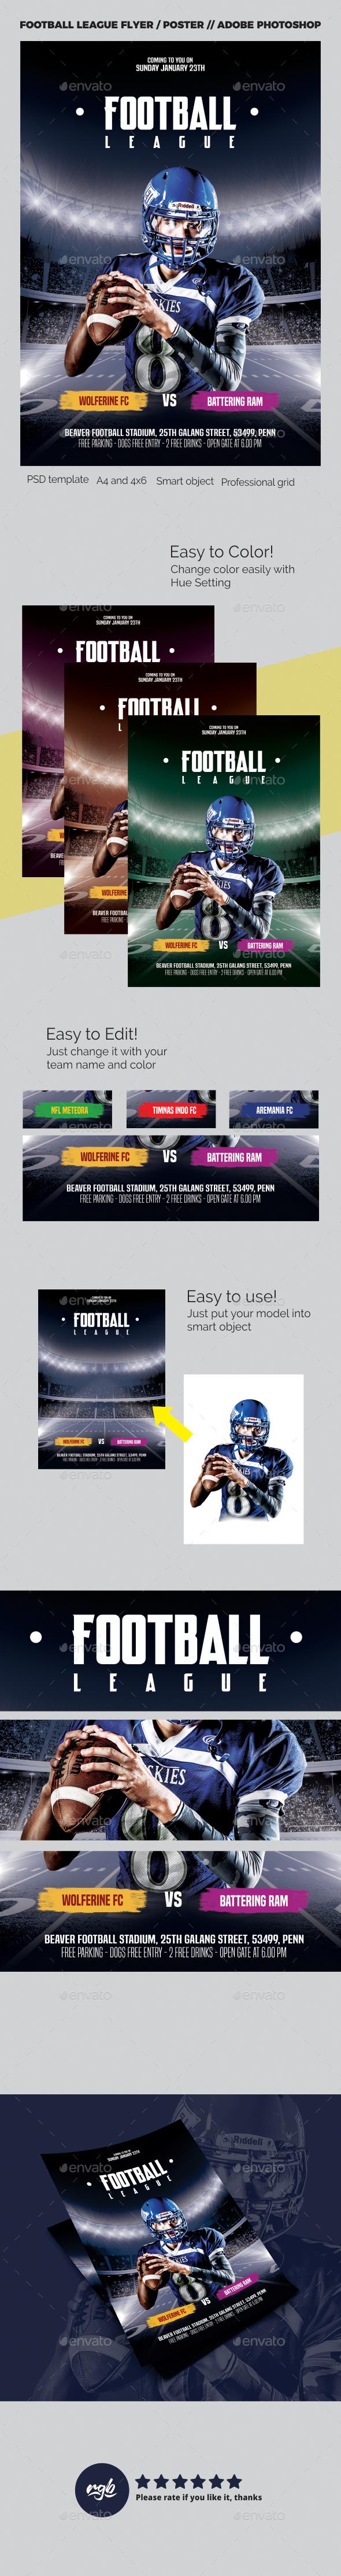 GraphicRiver Football League Flyer 21165790